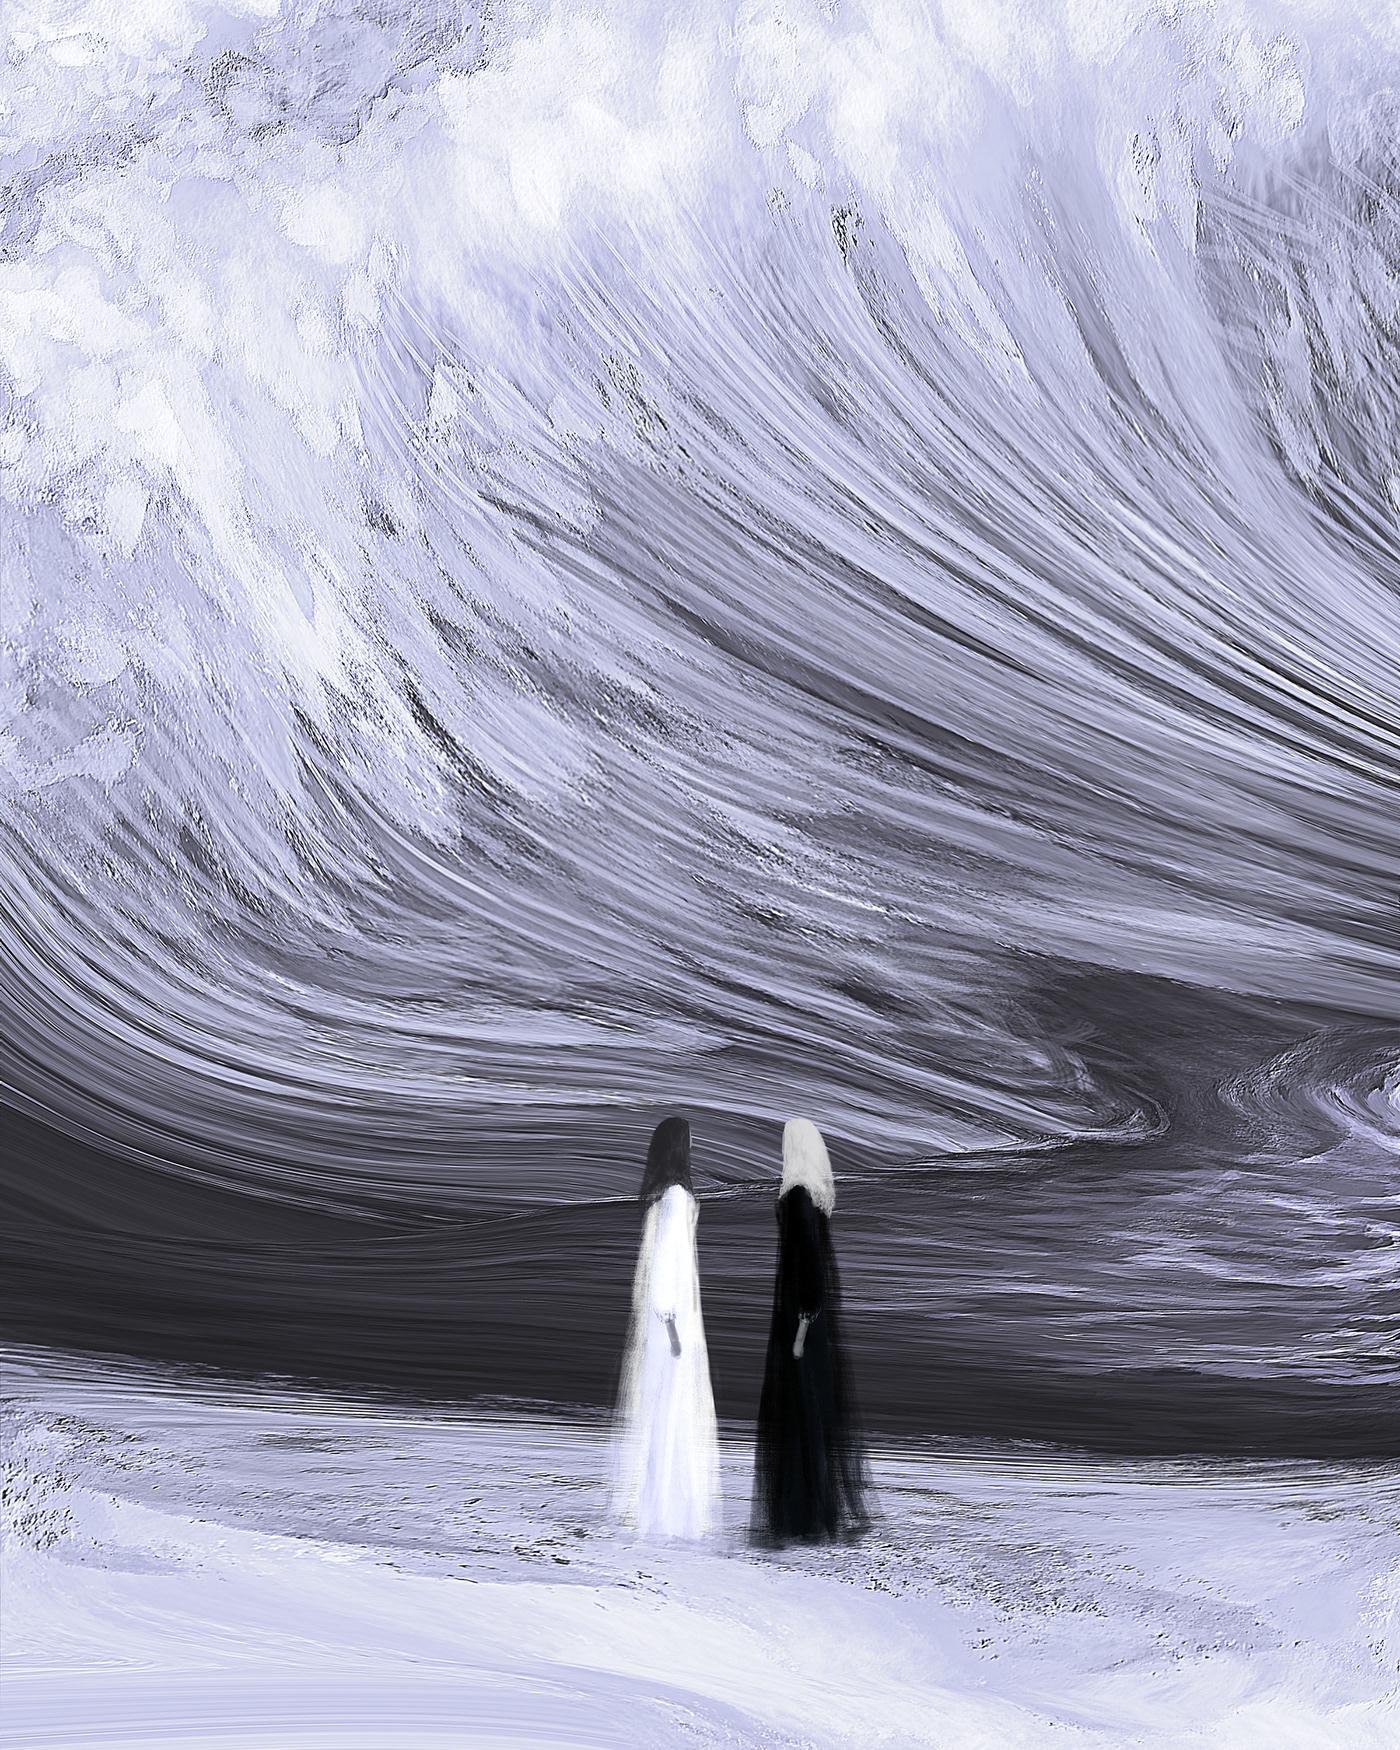 grey surreal black cloud mask winter art water